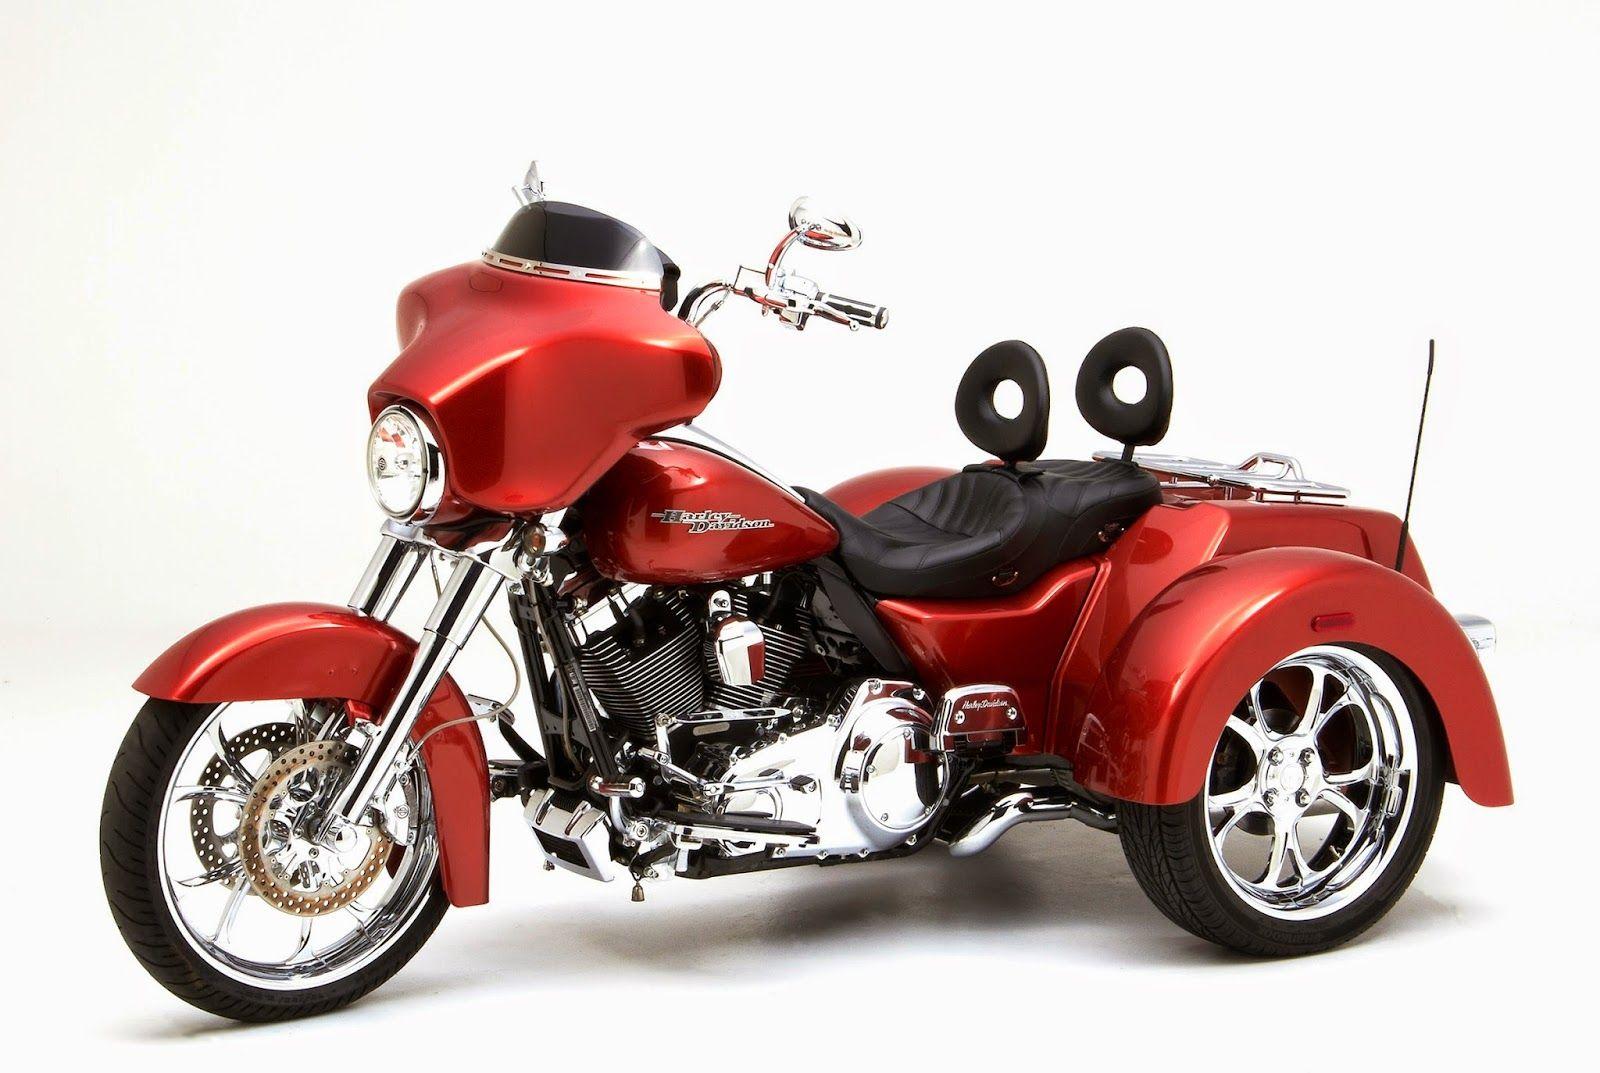 hd freewheeler - google search   biker stuff   pinterest   harley